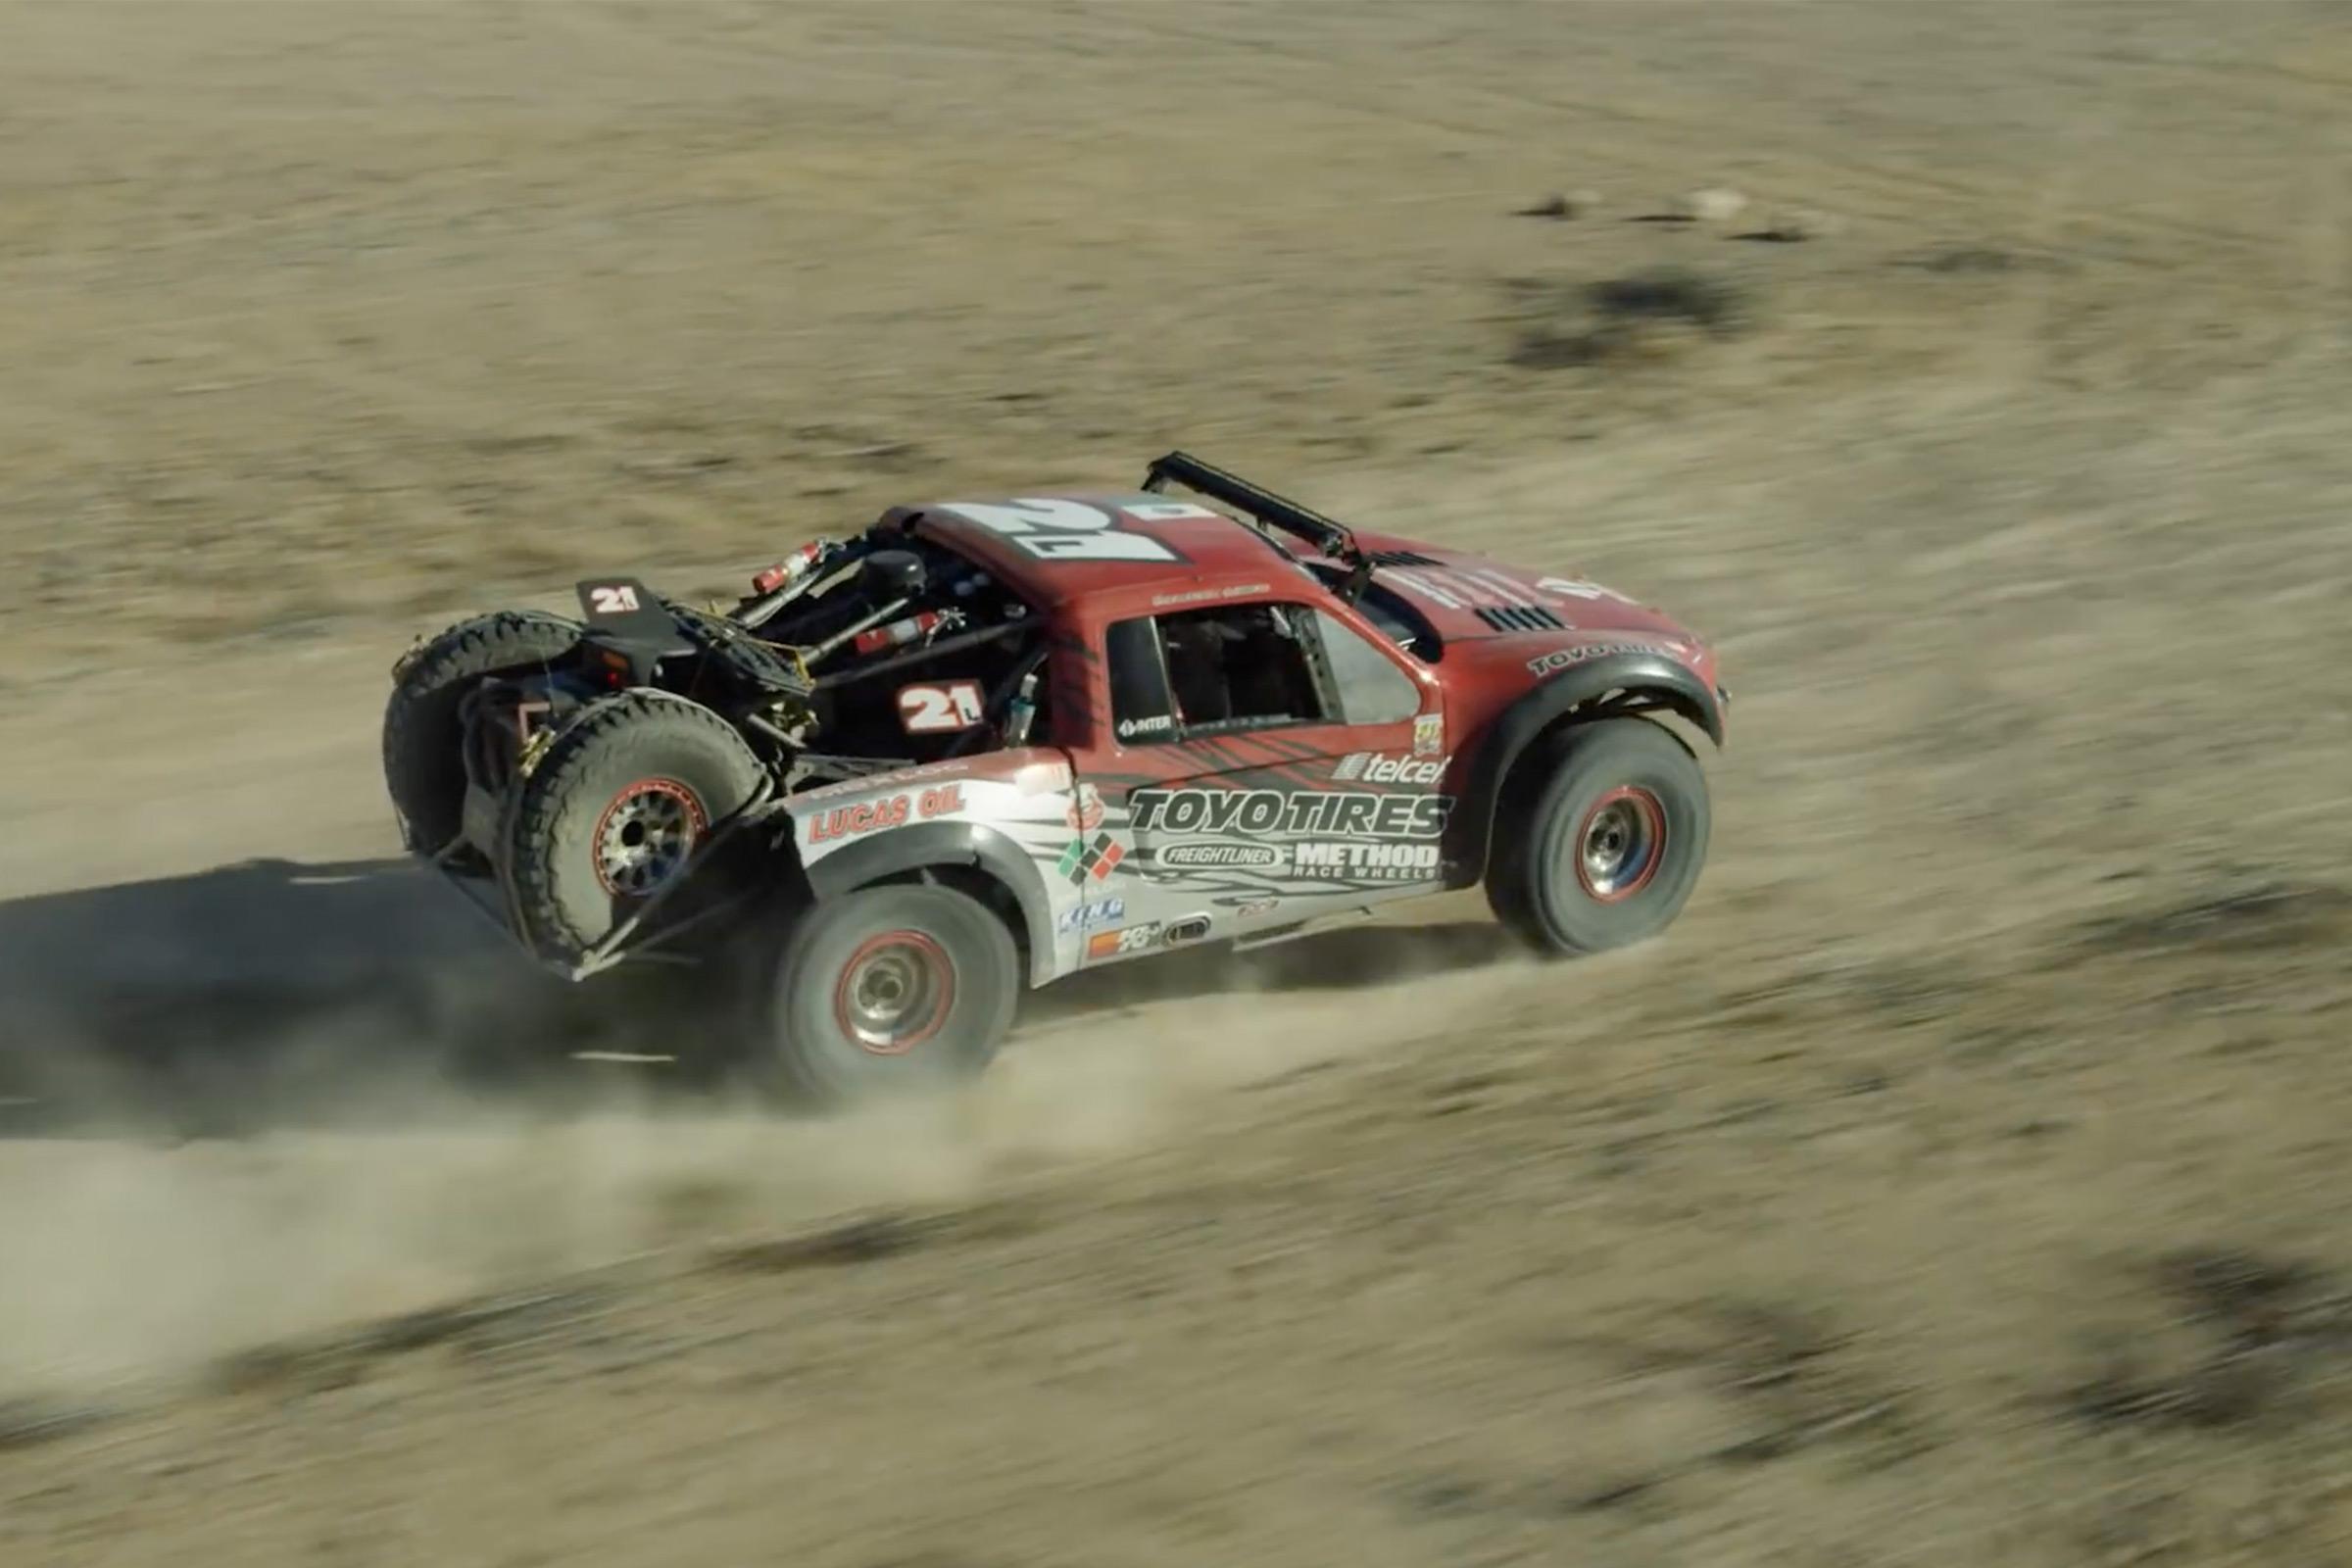 Video: Toyo Tires 2017 SCORE Baja 1000 Highlights